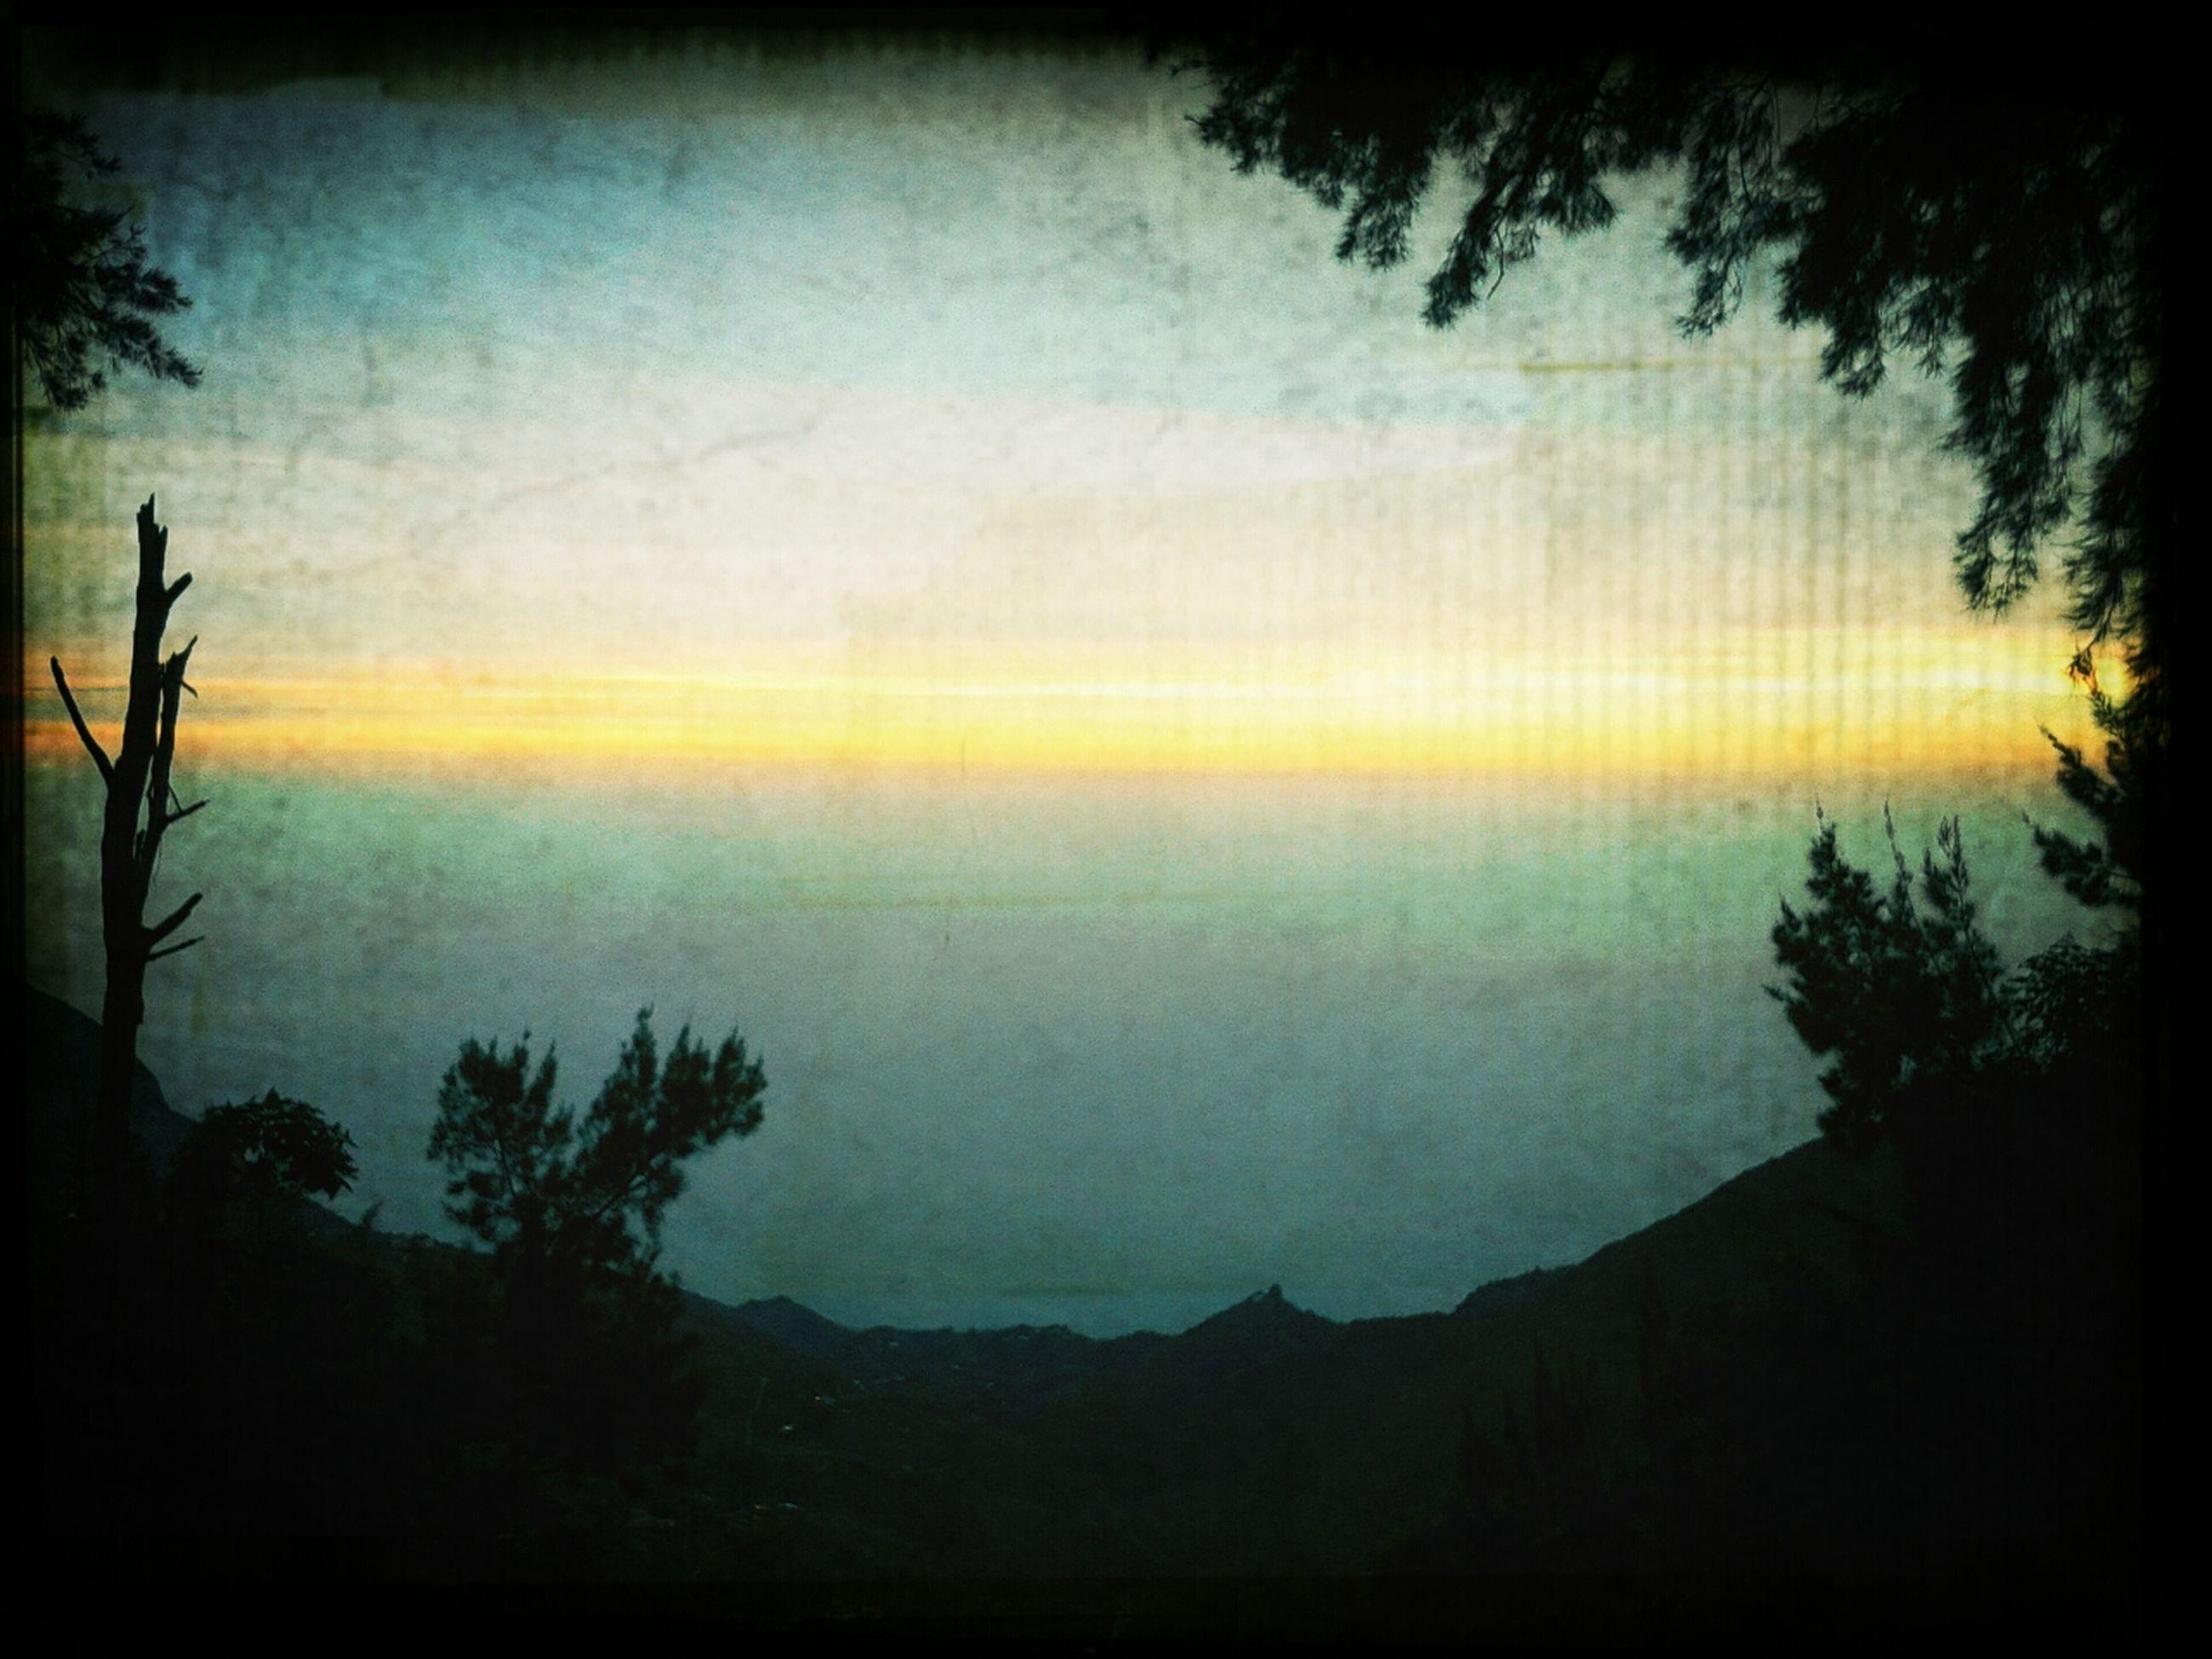 sunset, silhouette, tranquil scene, scenics, tranquility, transfer print, beauty in nature, sky, auto post production filter, tree, nature, idyllic, landscape, dusk, orange color, outdoors, cloud - sky, non urban scene, branch, sun